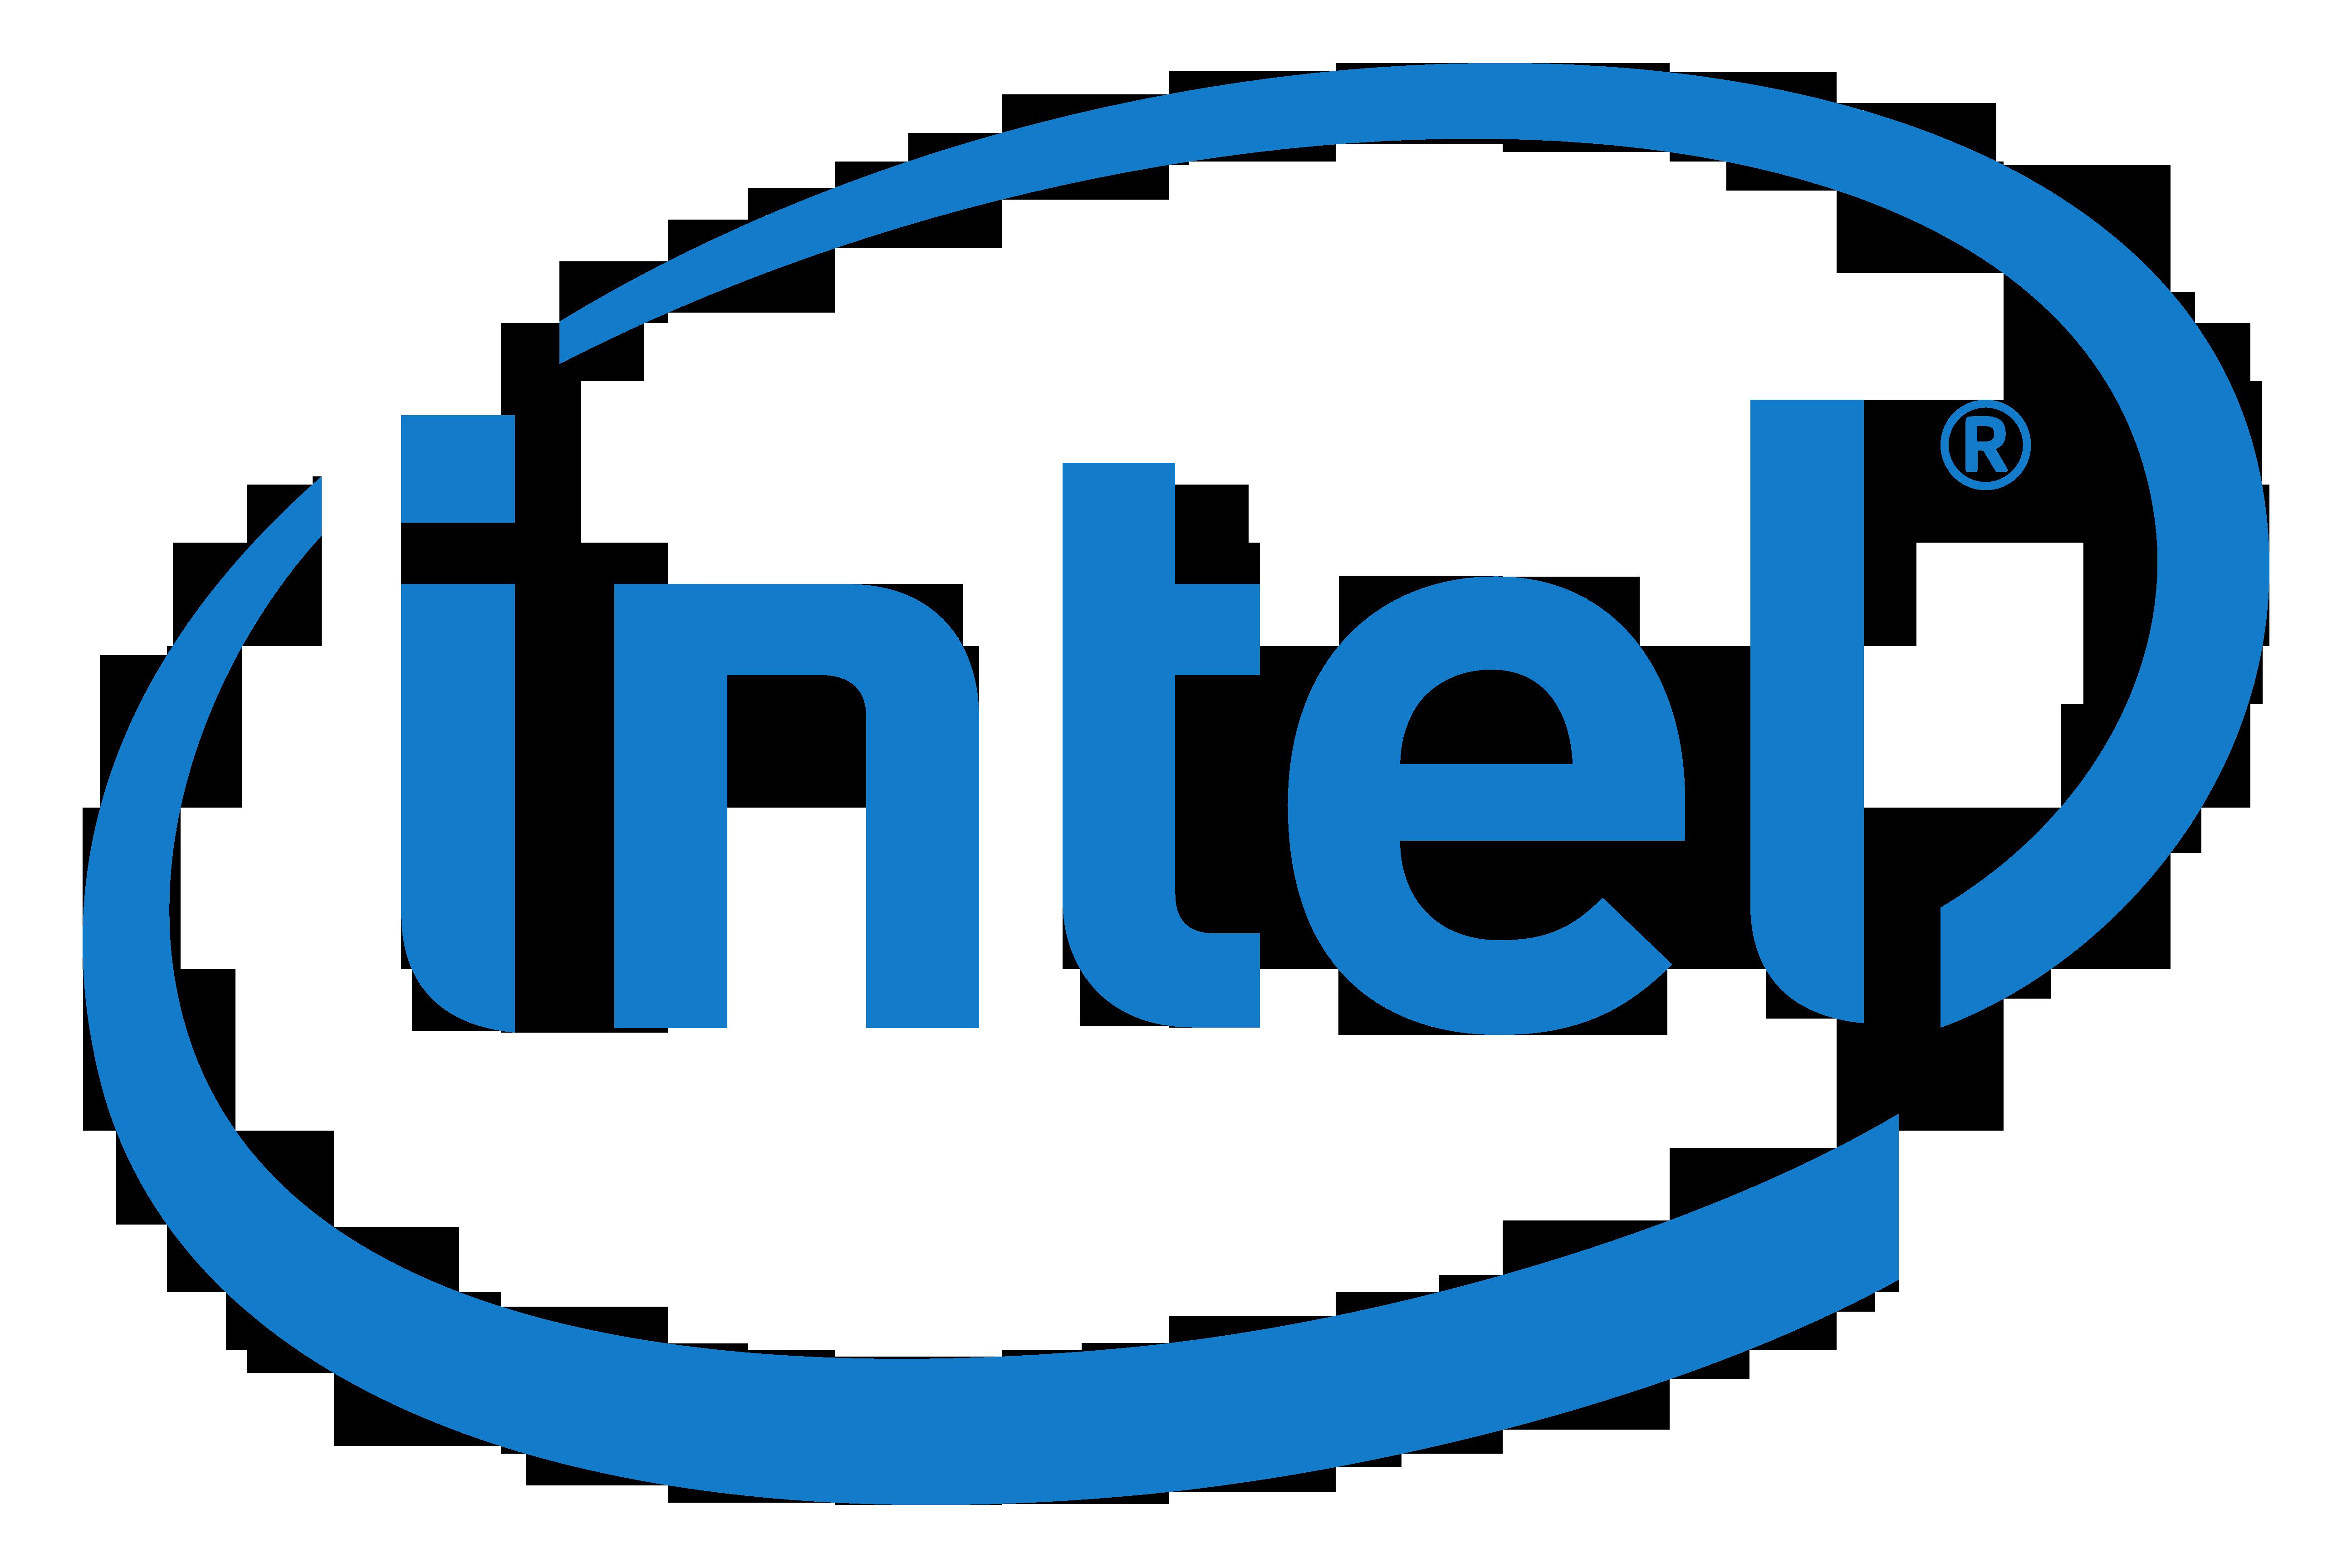 Intel Logo Png Hdpng.com  - Intel type, Transparent background PNG HD thumbnail